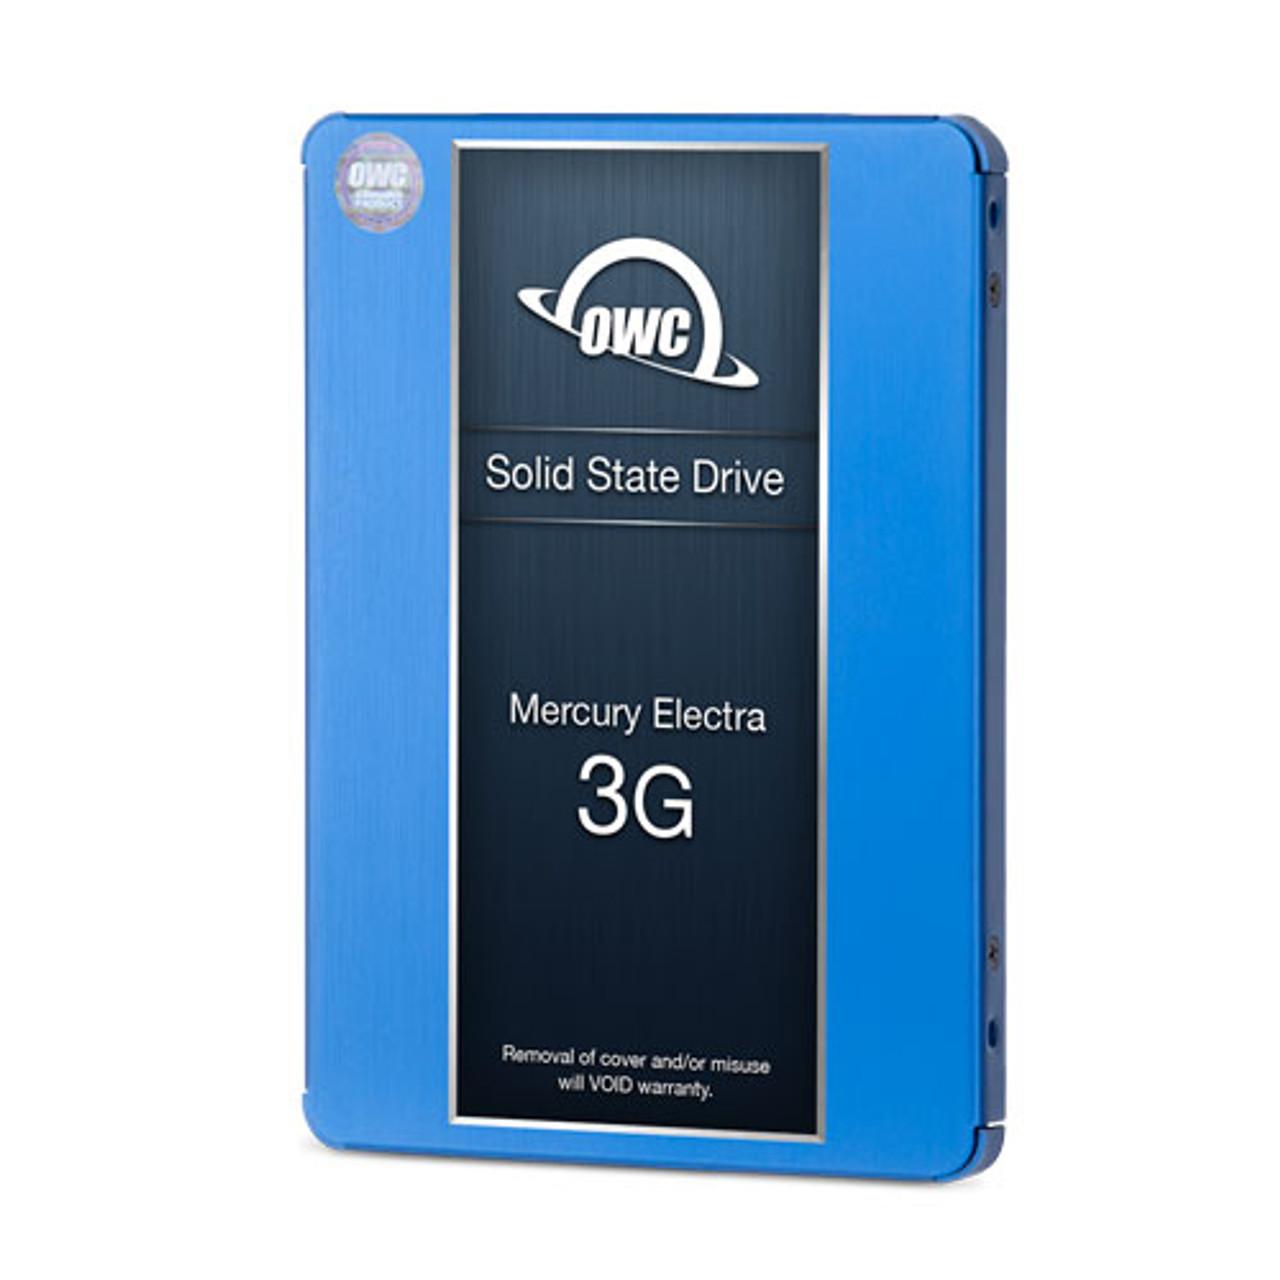 OWC 250GB Mercury Electra 3G SSD and Adapta-Drive 2.5-inch to 3.5-inch DIY bundle kit